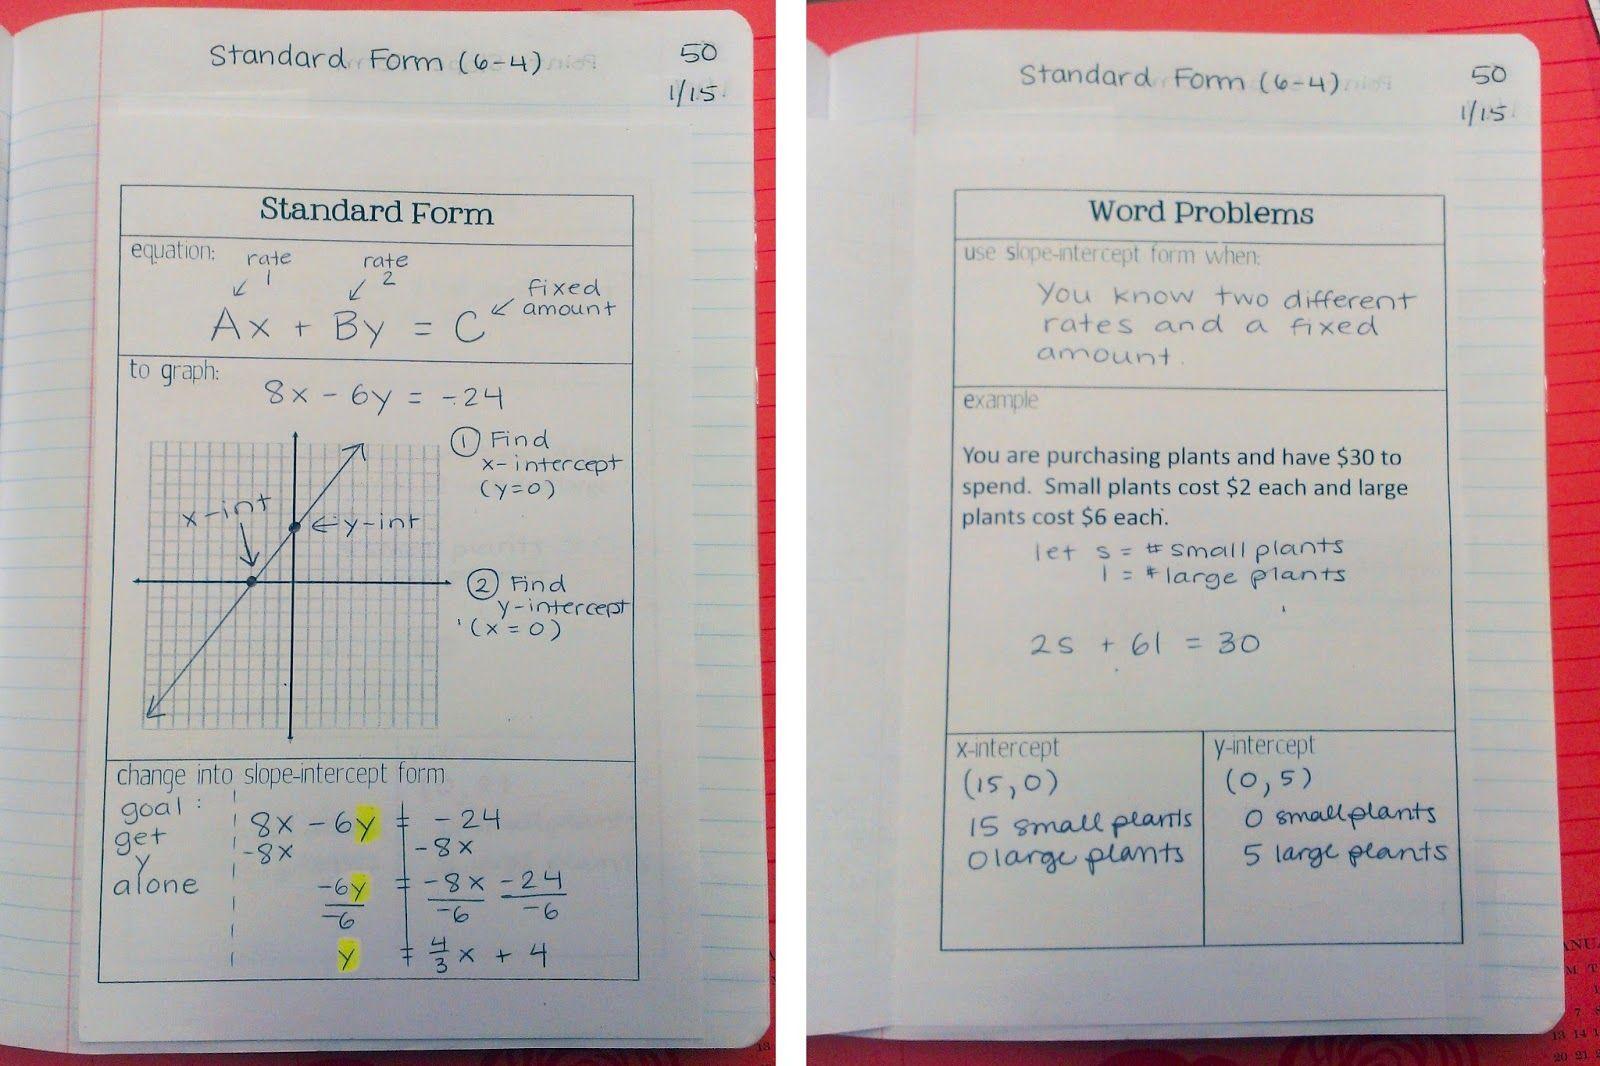 standard form notes  Standard Form Notes | Math notebooks, Algebra, Math classroom